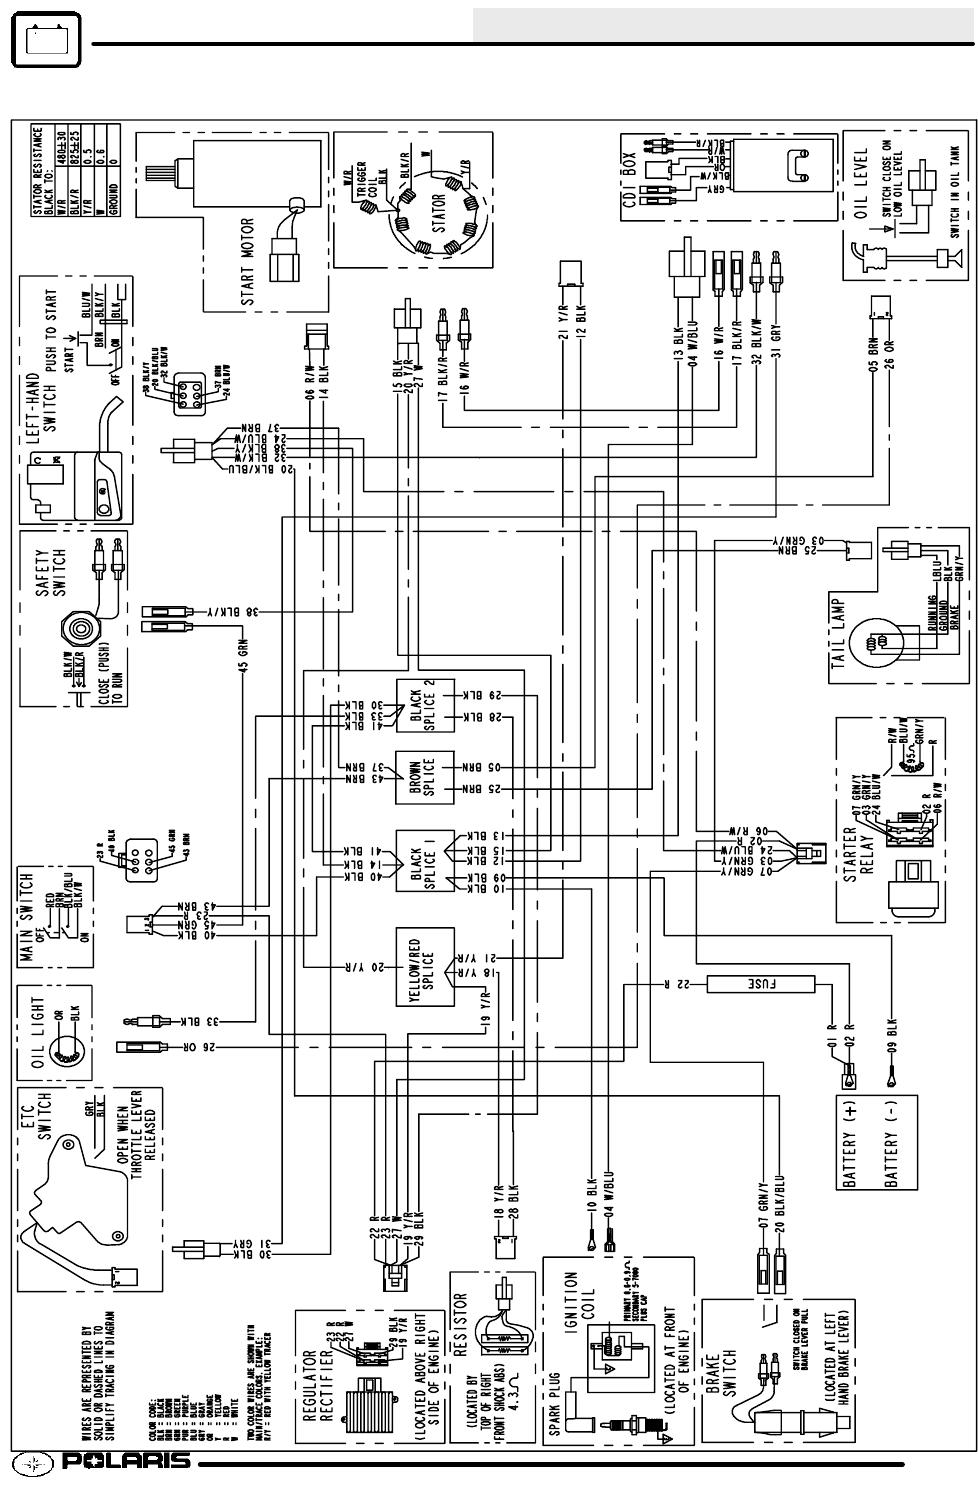 1995 Ktm Stator Wiring Diagram 1986 Dodge D100 Wiring Diagram Source Auto5 Yenpancane Jeanjaures37 Fr